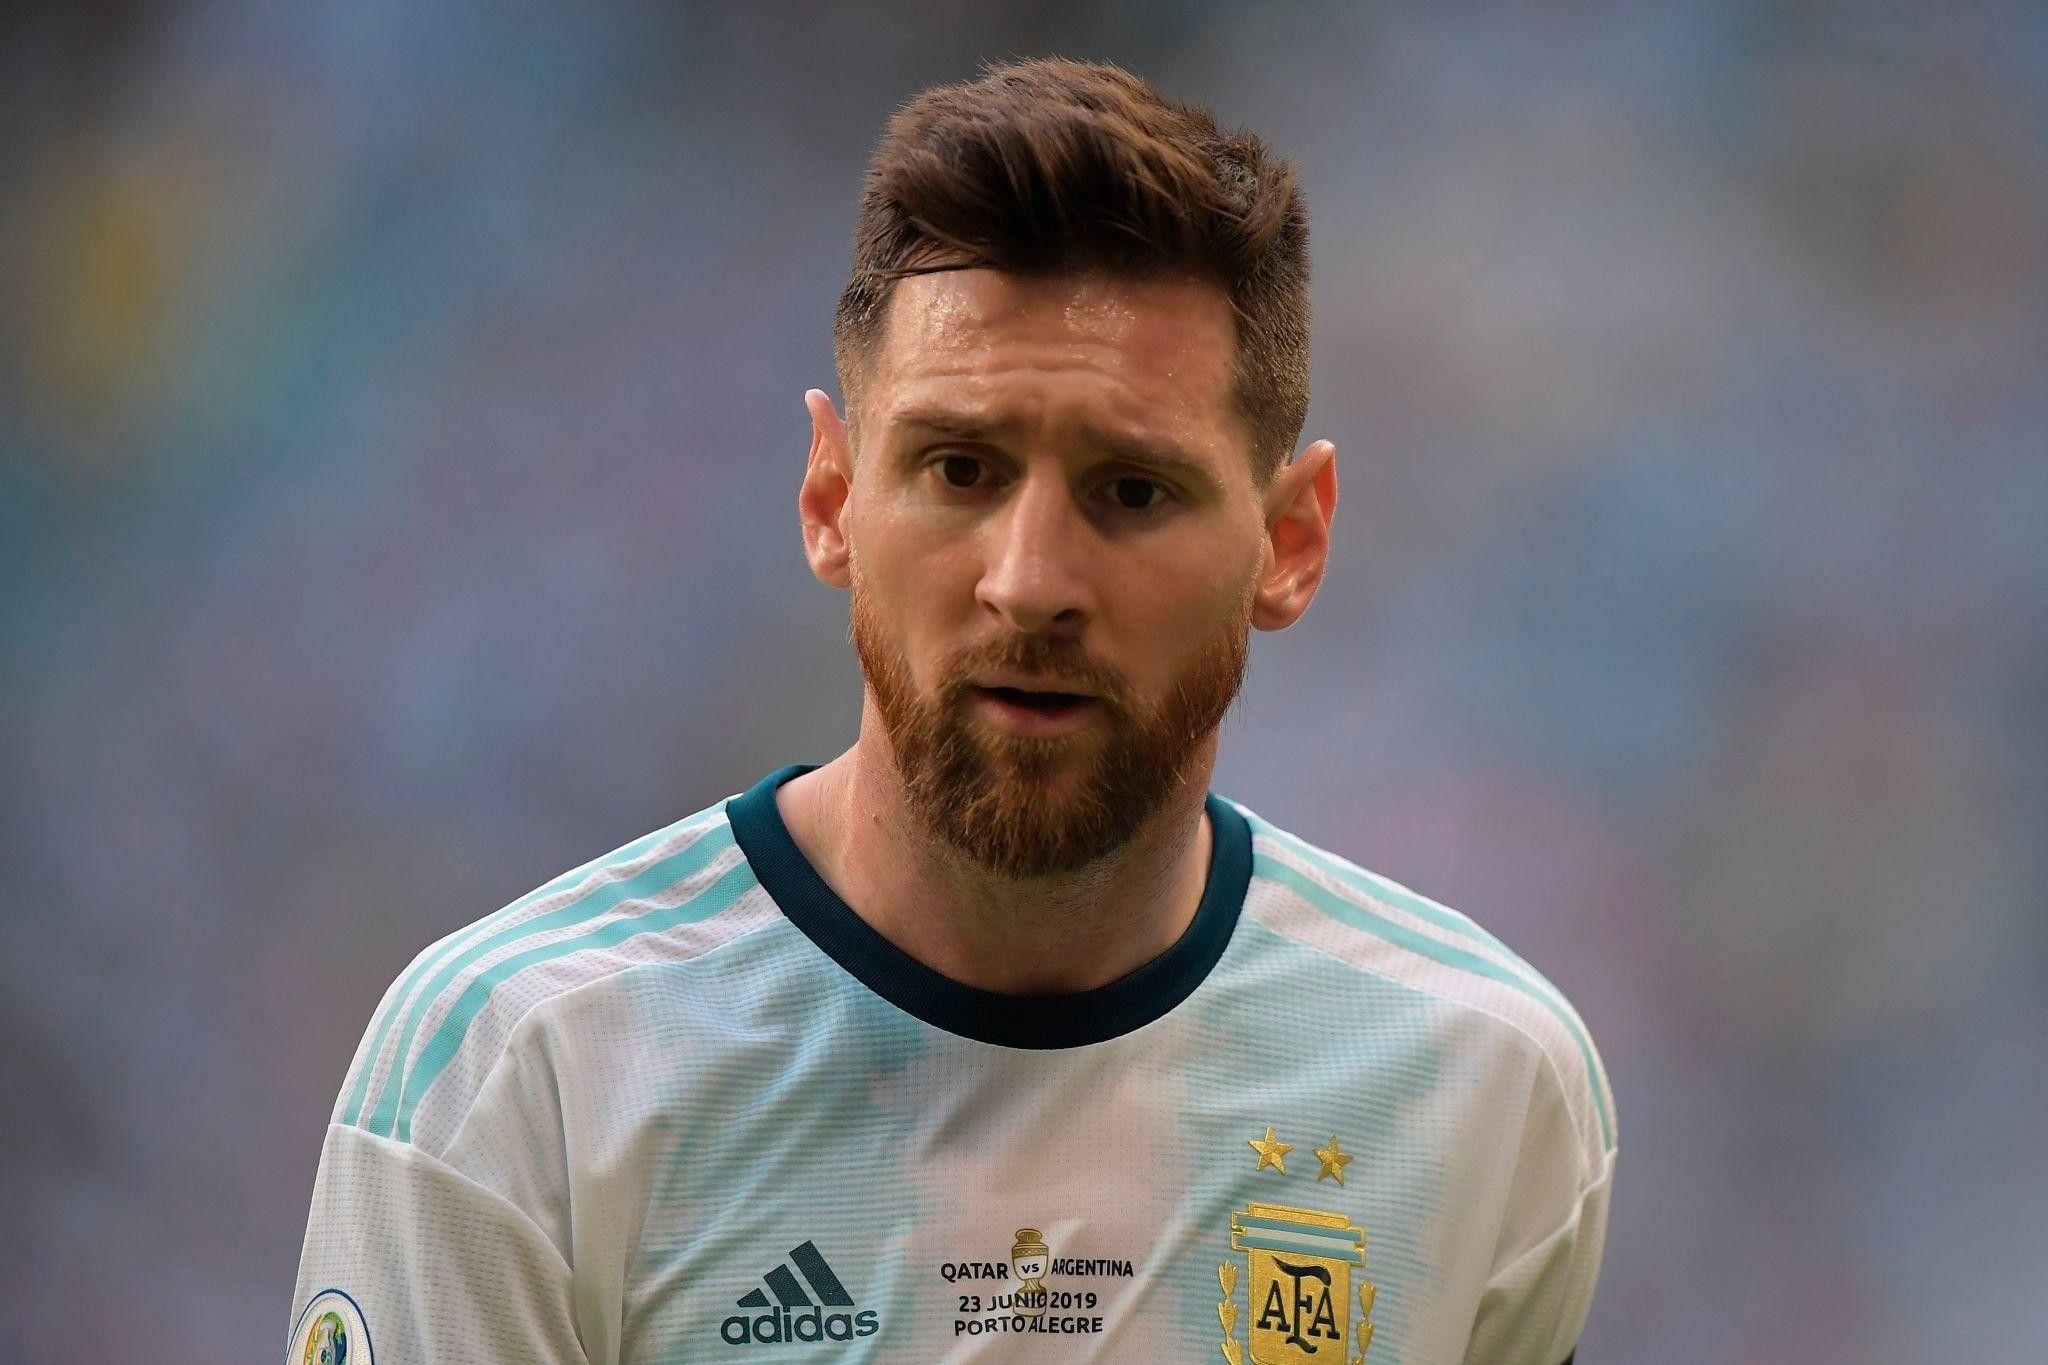 Pin By Marianna Jauregui On Lionel Messi Leo Messi Lionel Messi Messi